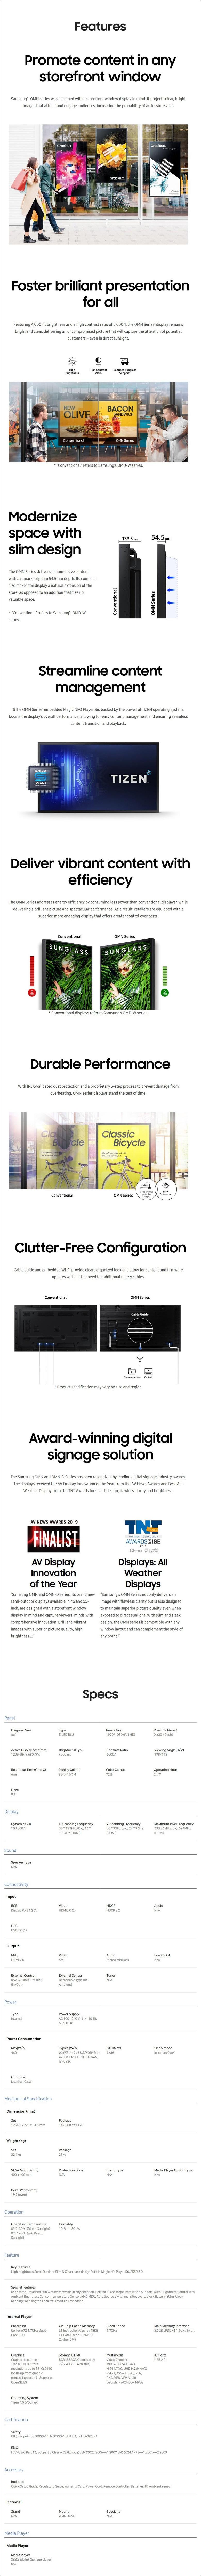 "Samsung OMN Series 55"" Full HD 24/7 Bright Window Display - Desktop Overview 2"